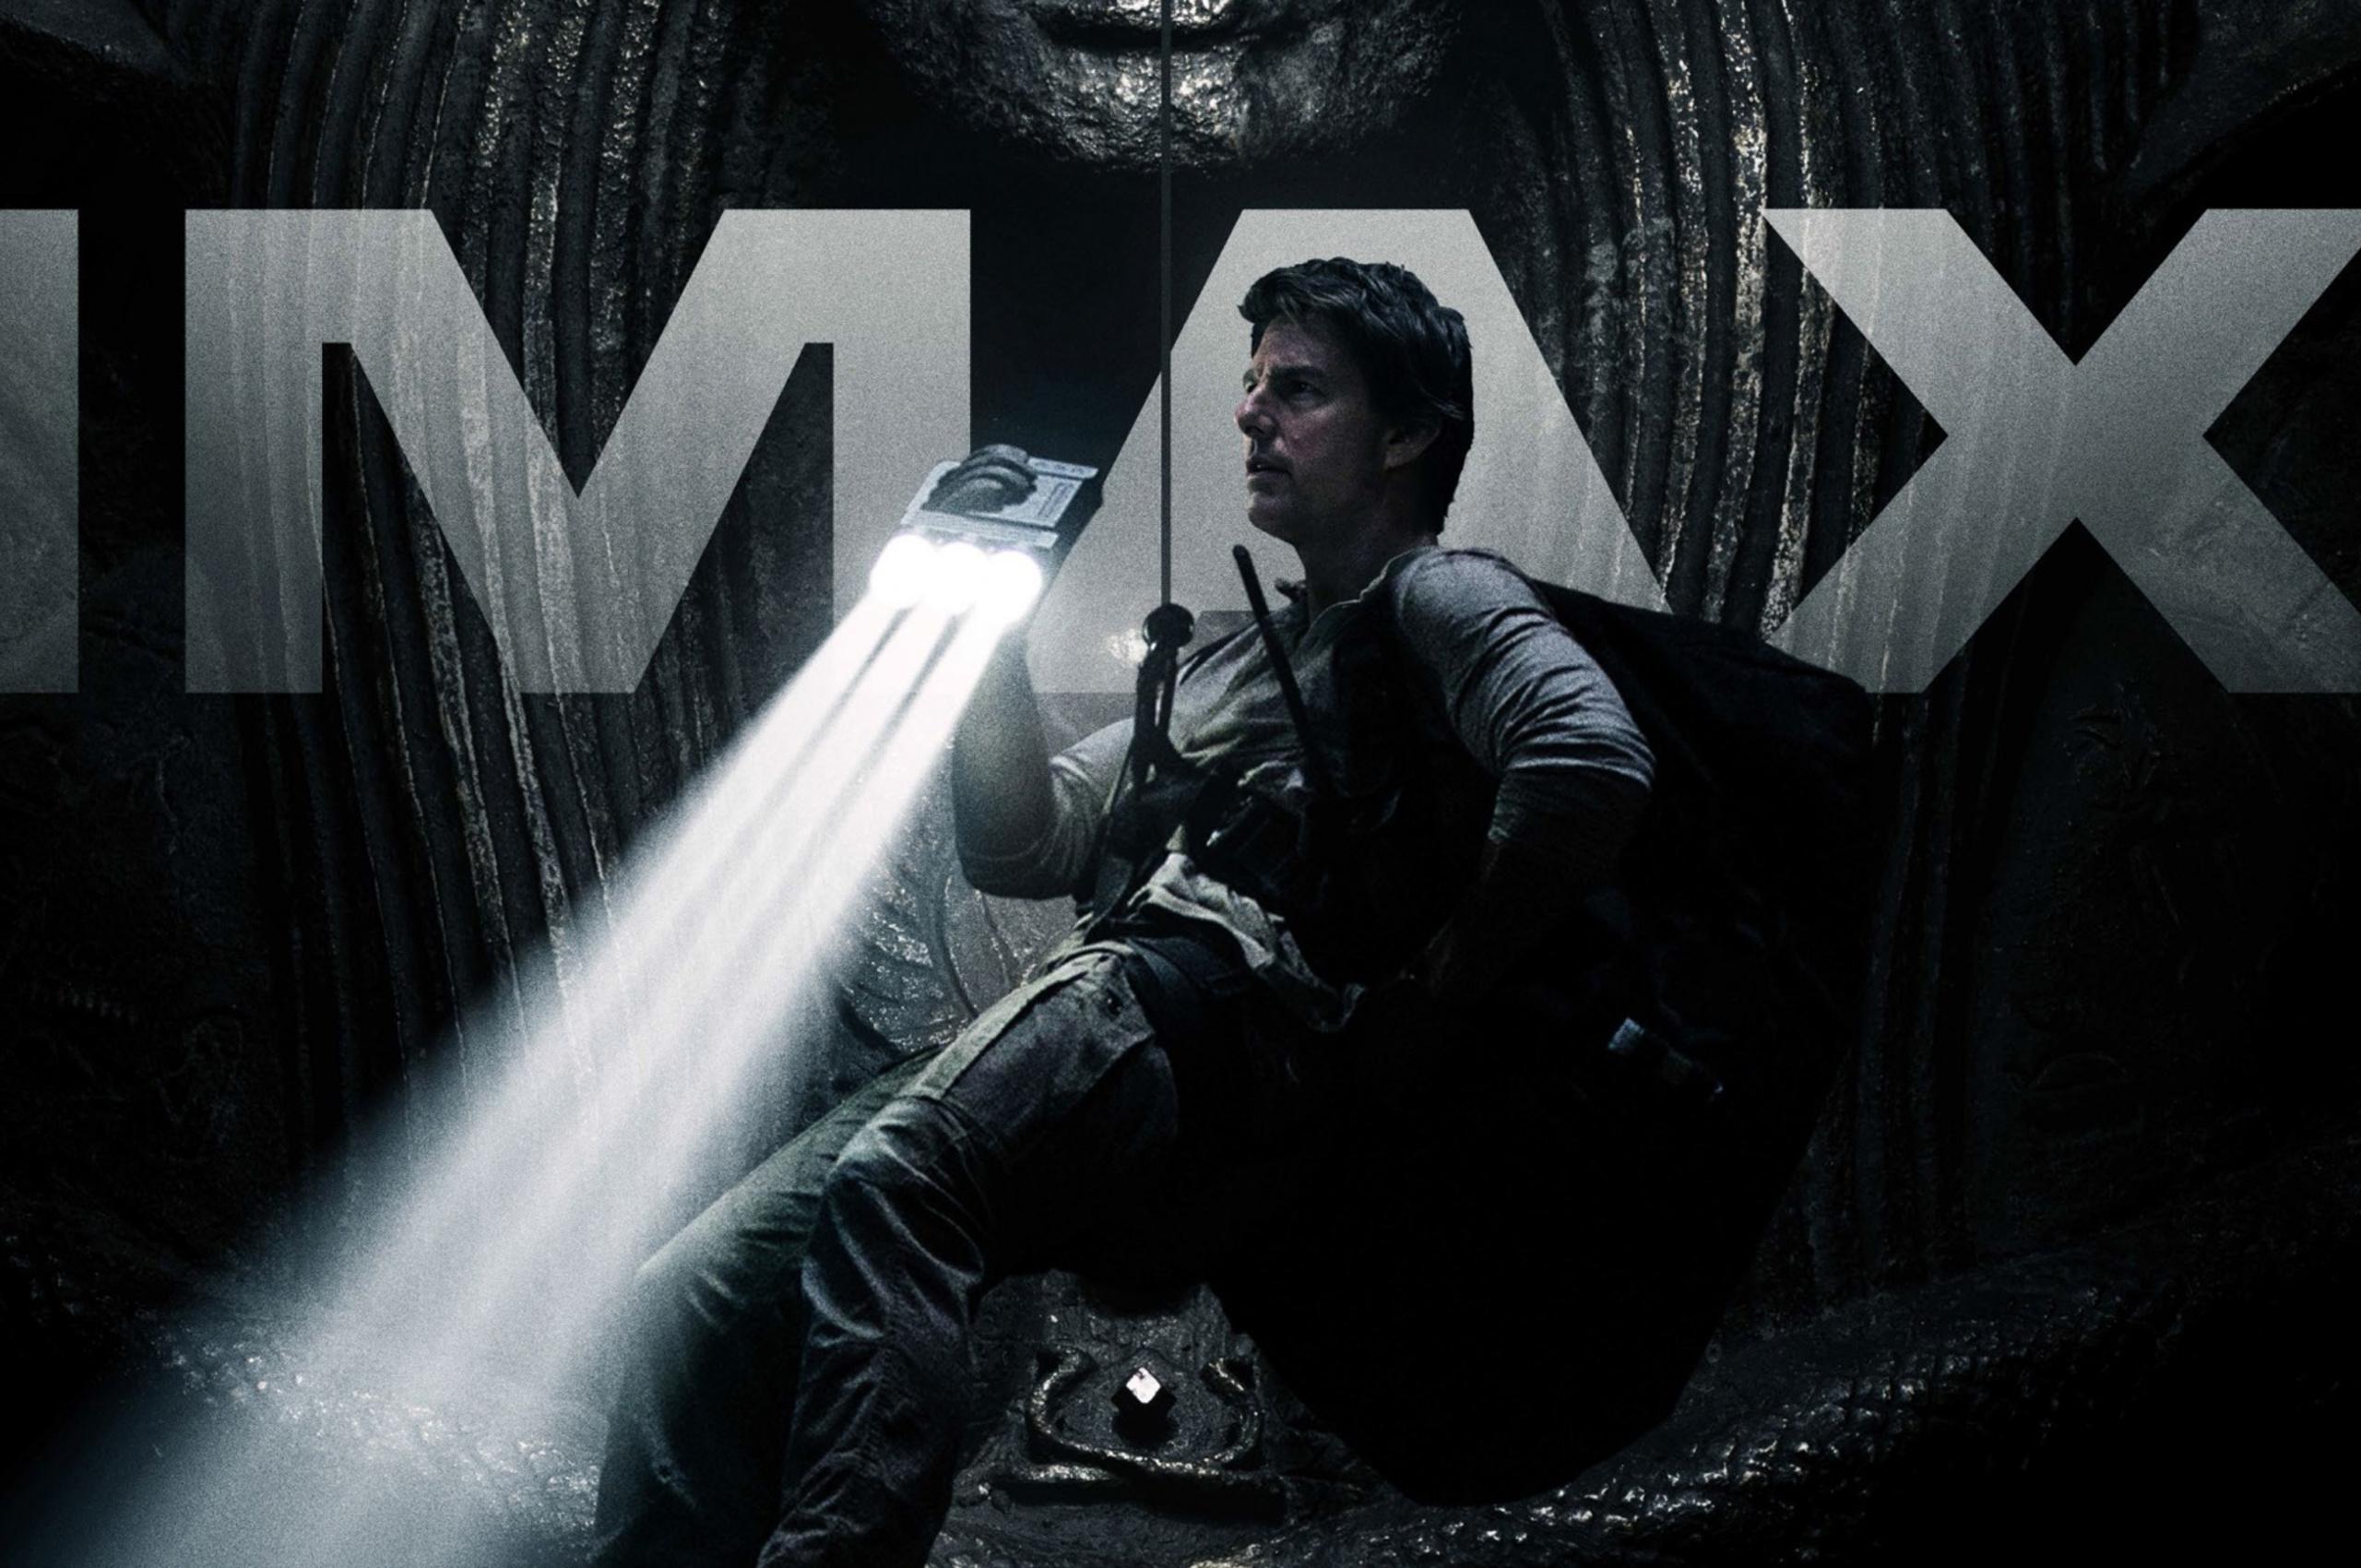 2560x1700 The Mummy Tom Cruise Imax Chromebook Pixel Hd 4k